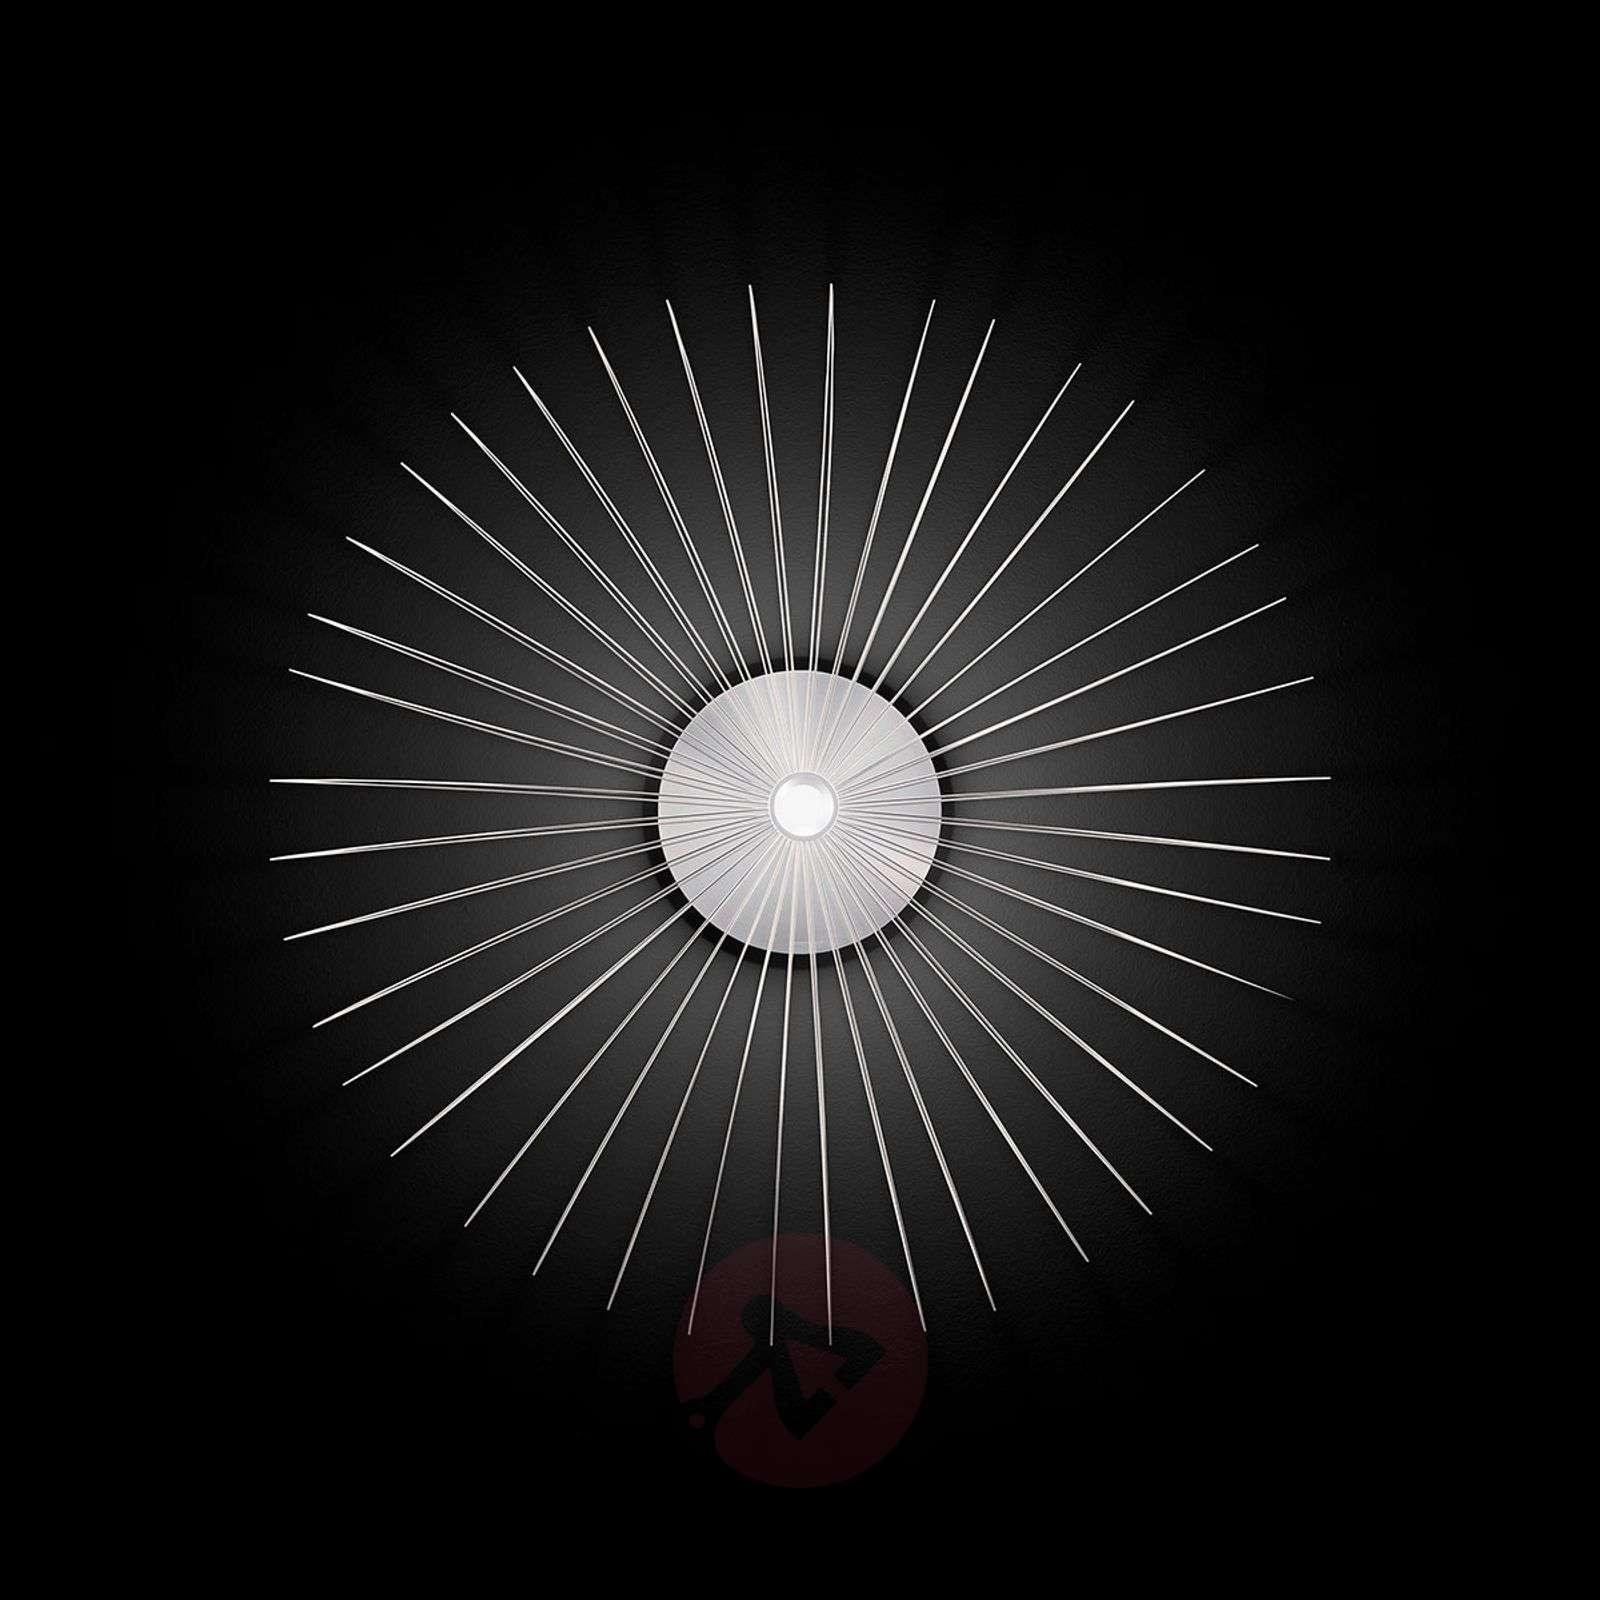 GROSSMANN Faye LED-kattovalaisin 75 cm-4022023-01